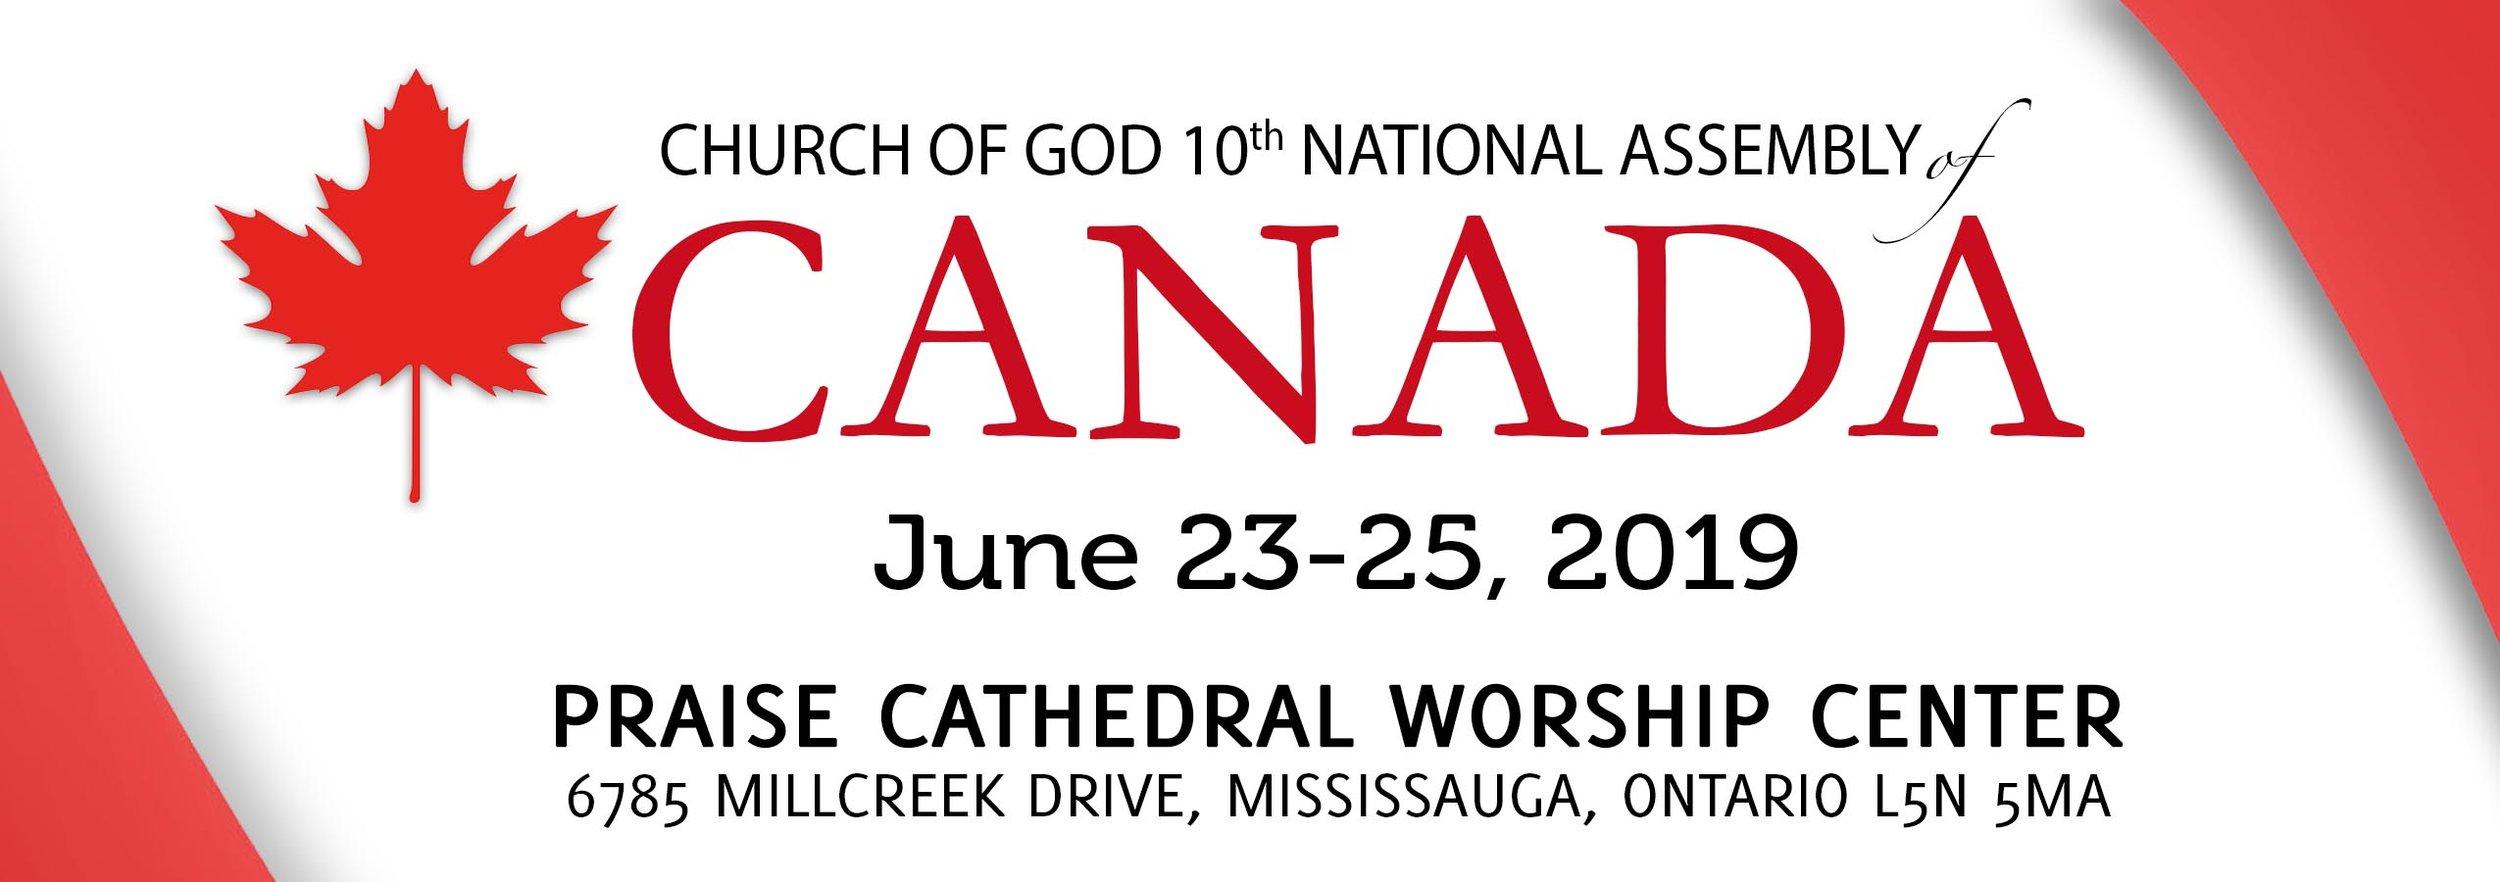 Canada banner.jpg